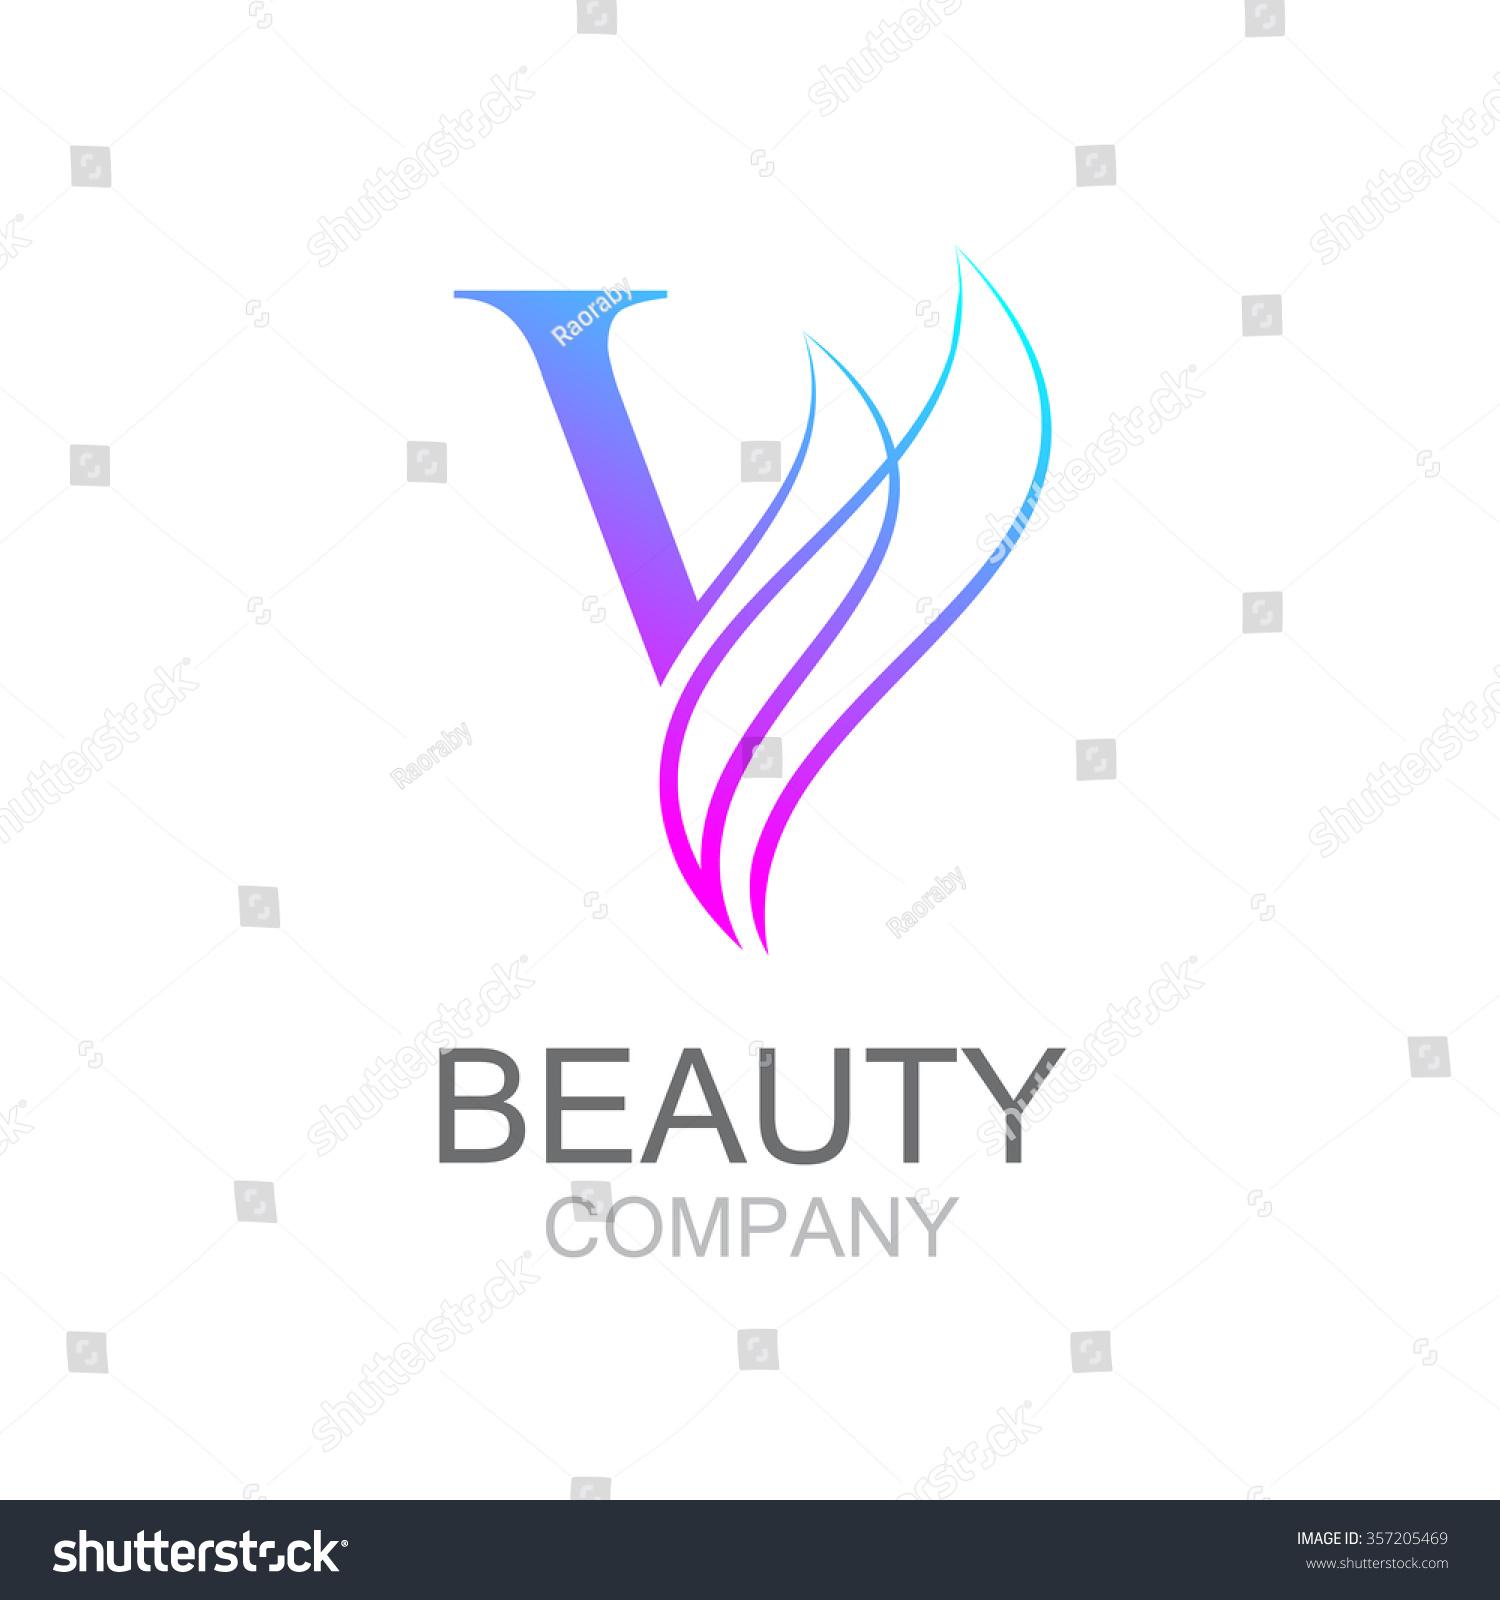 Abstract letter v logo design template stock vector for Hair salon companies